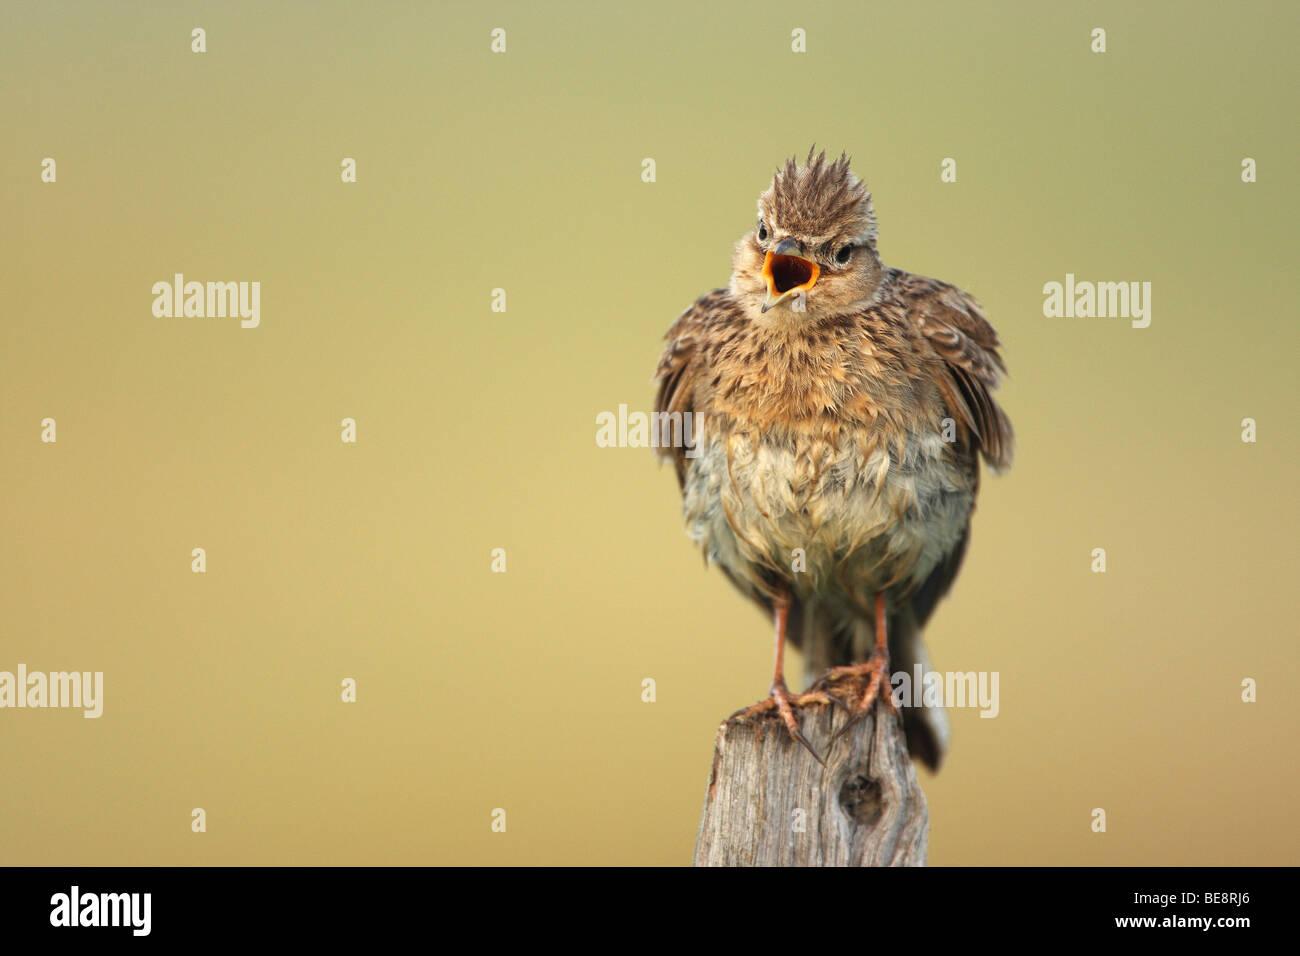 Zingende Veldleeuwerik (Alauda arvensis), Belgi Singing Skylark (Alauda arvensis), Belgium - Stock Image